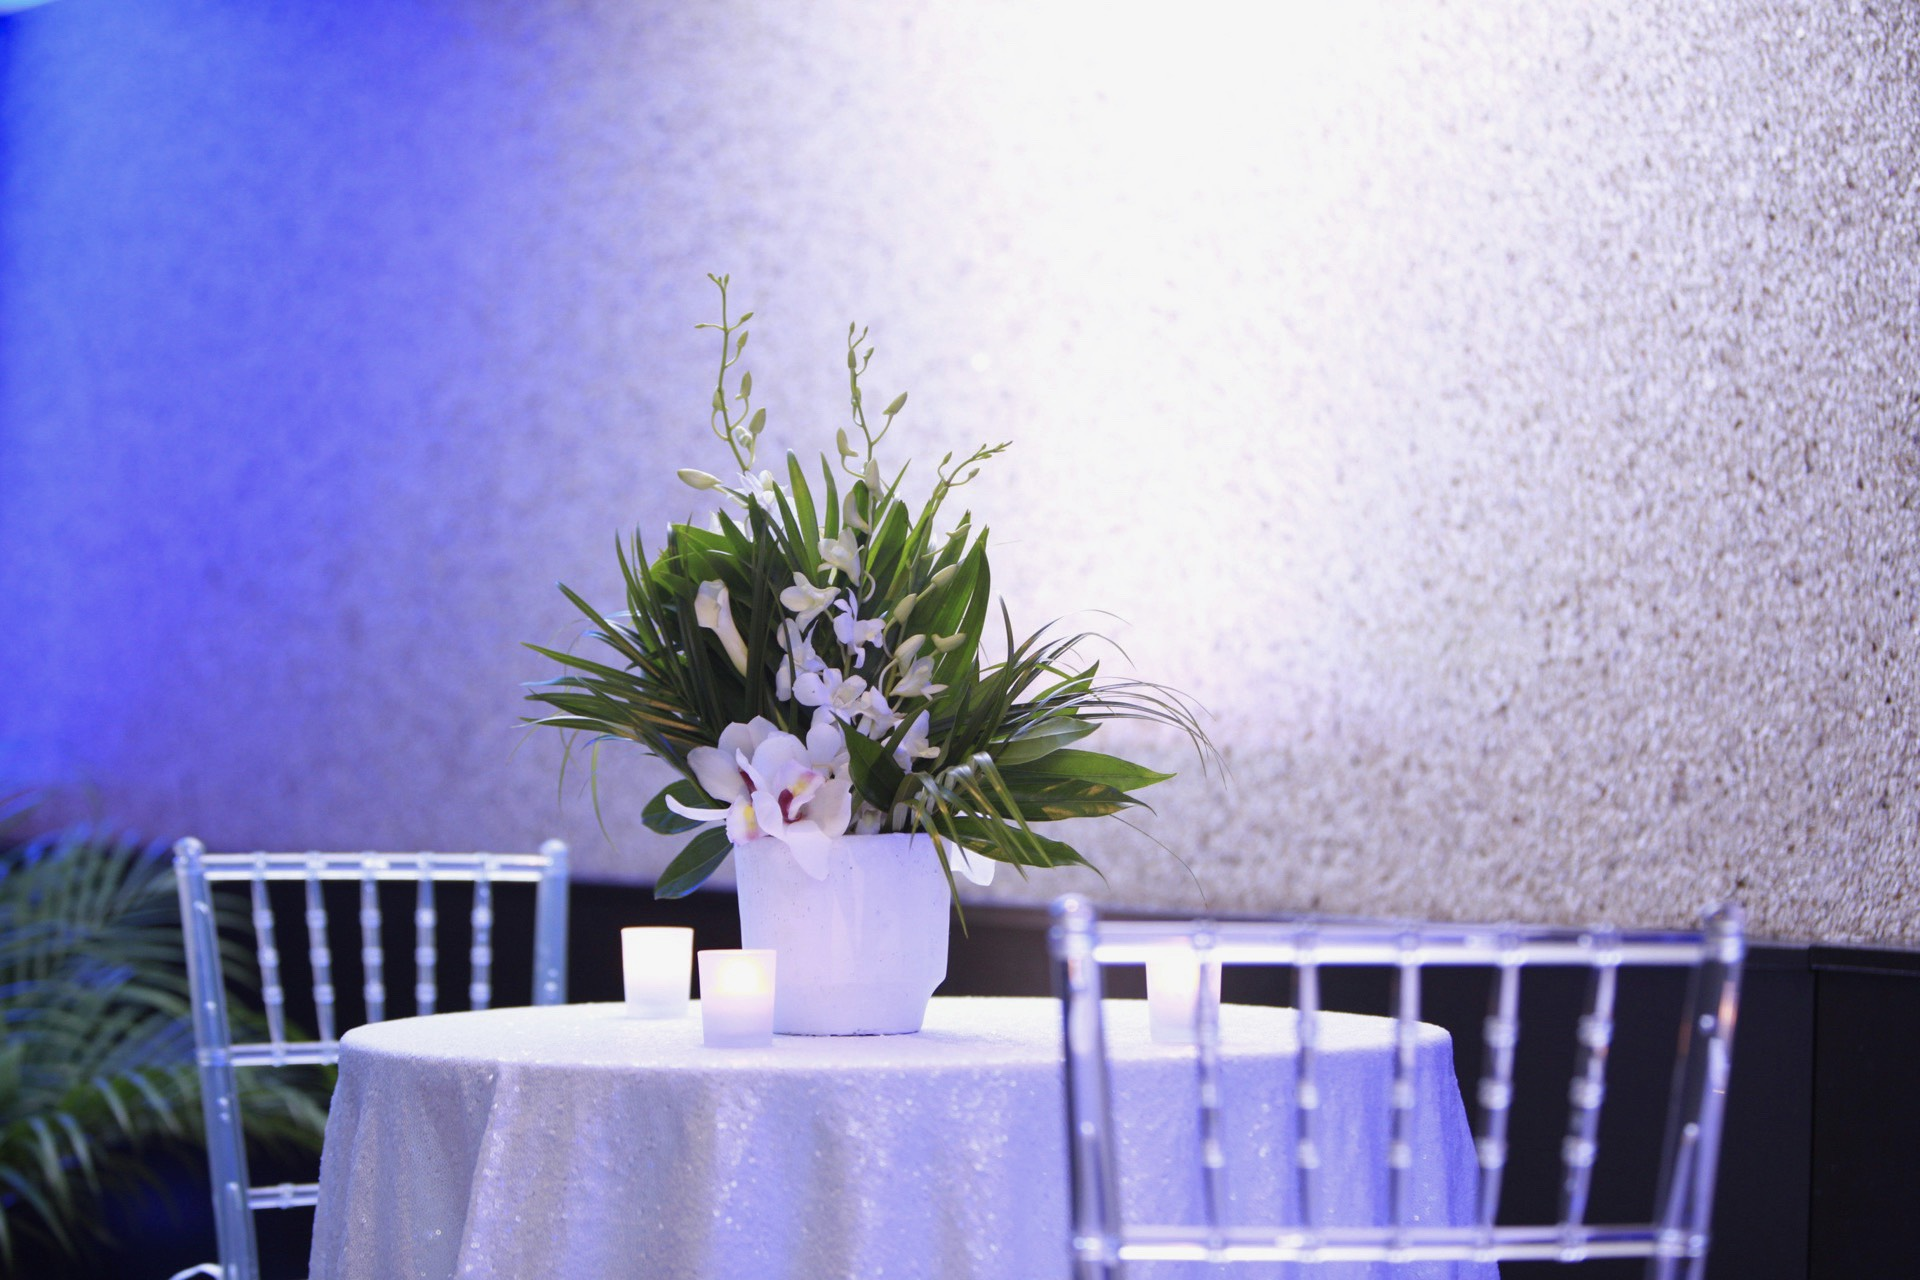 Amadeus_Miami_Florida_Brian_Adams_Malloy_Events_Corporate_Production